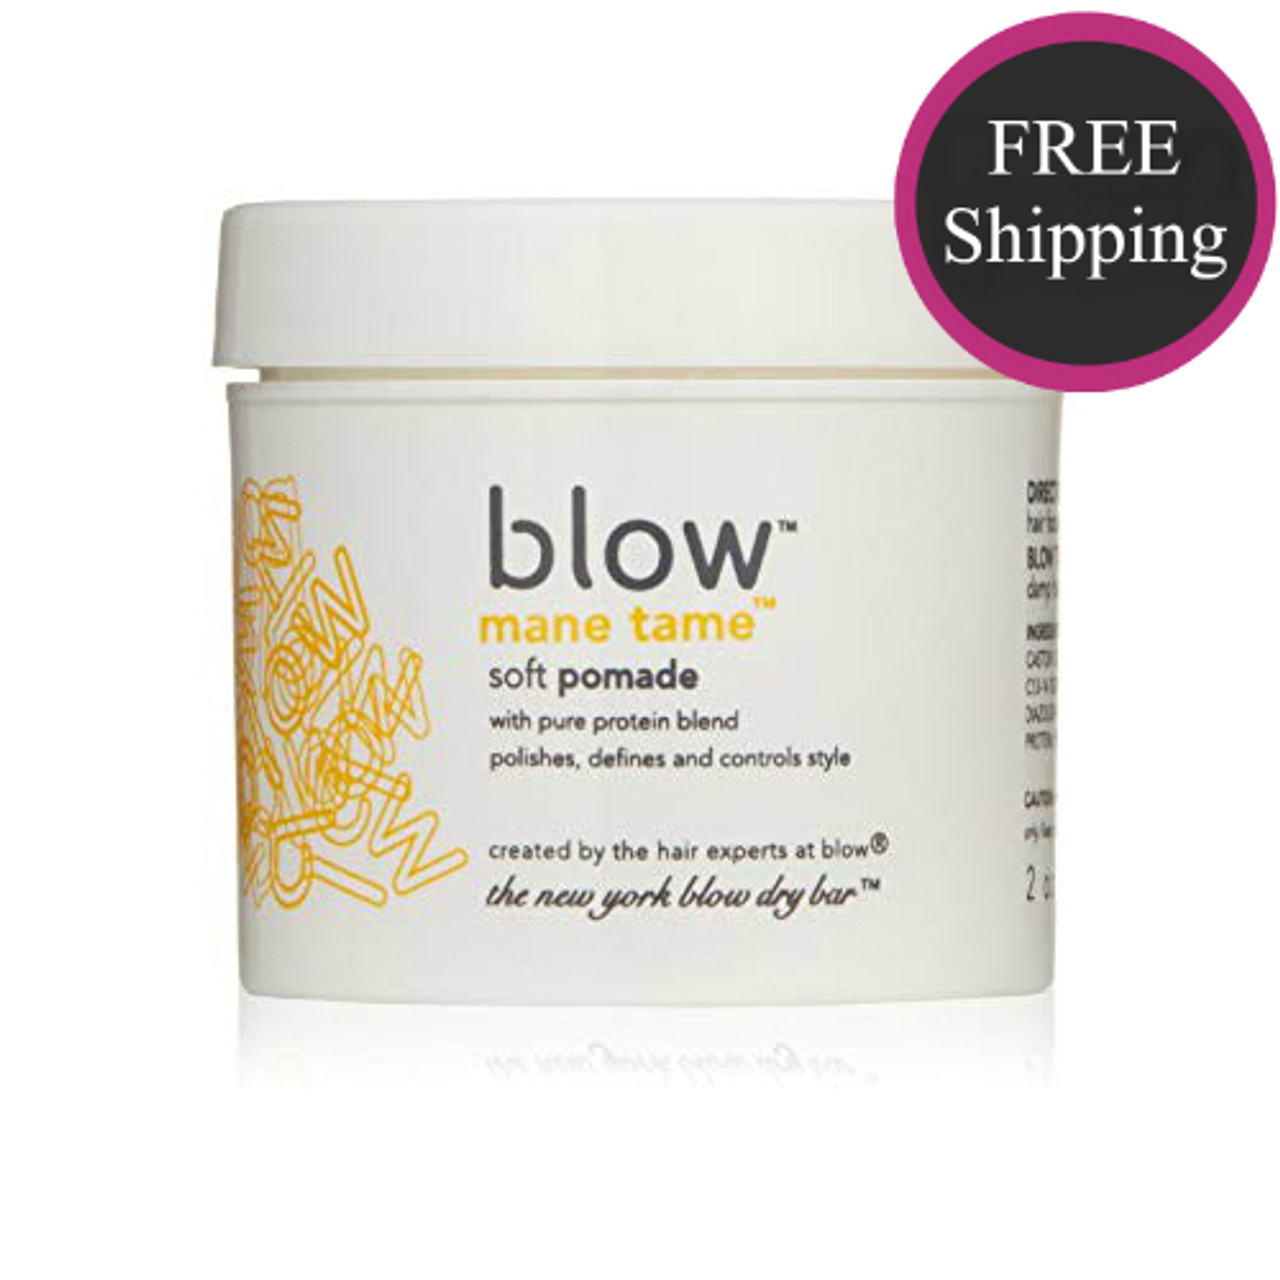 Blow Mane Tame Soft Pomade 2 oz: Free shipping